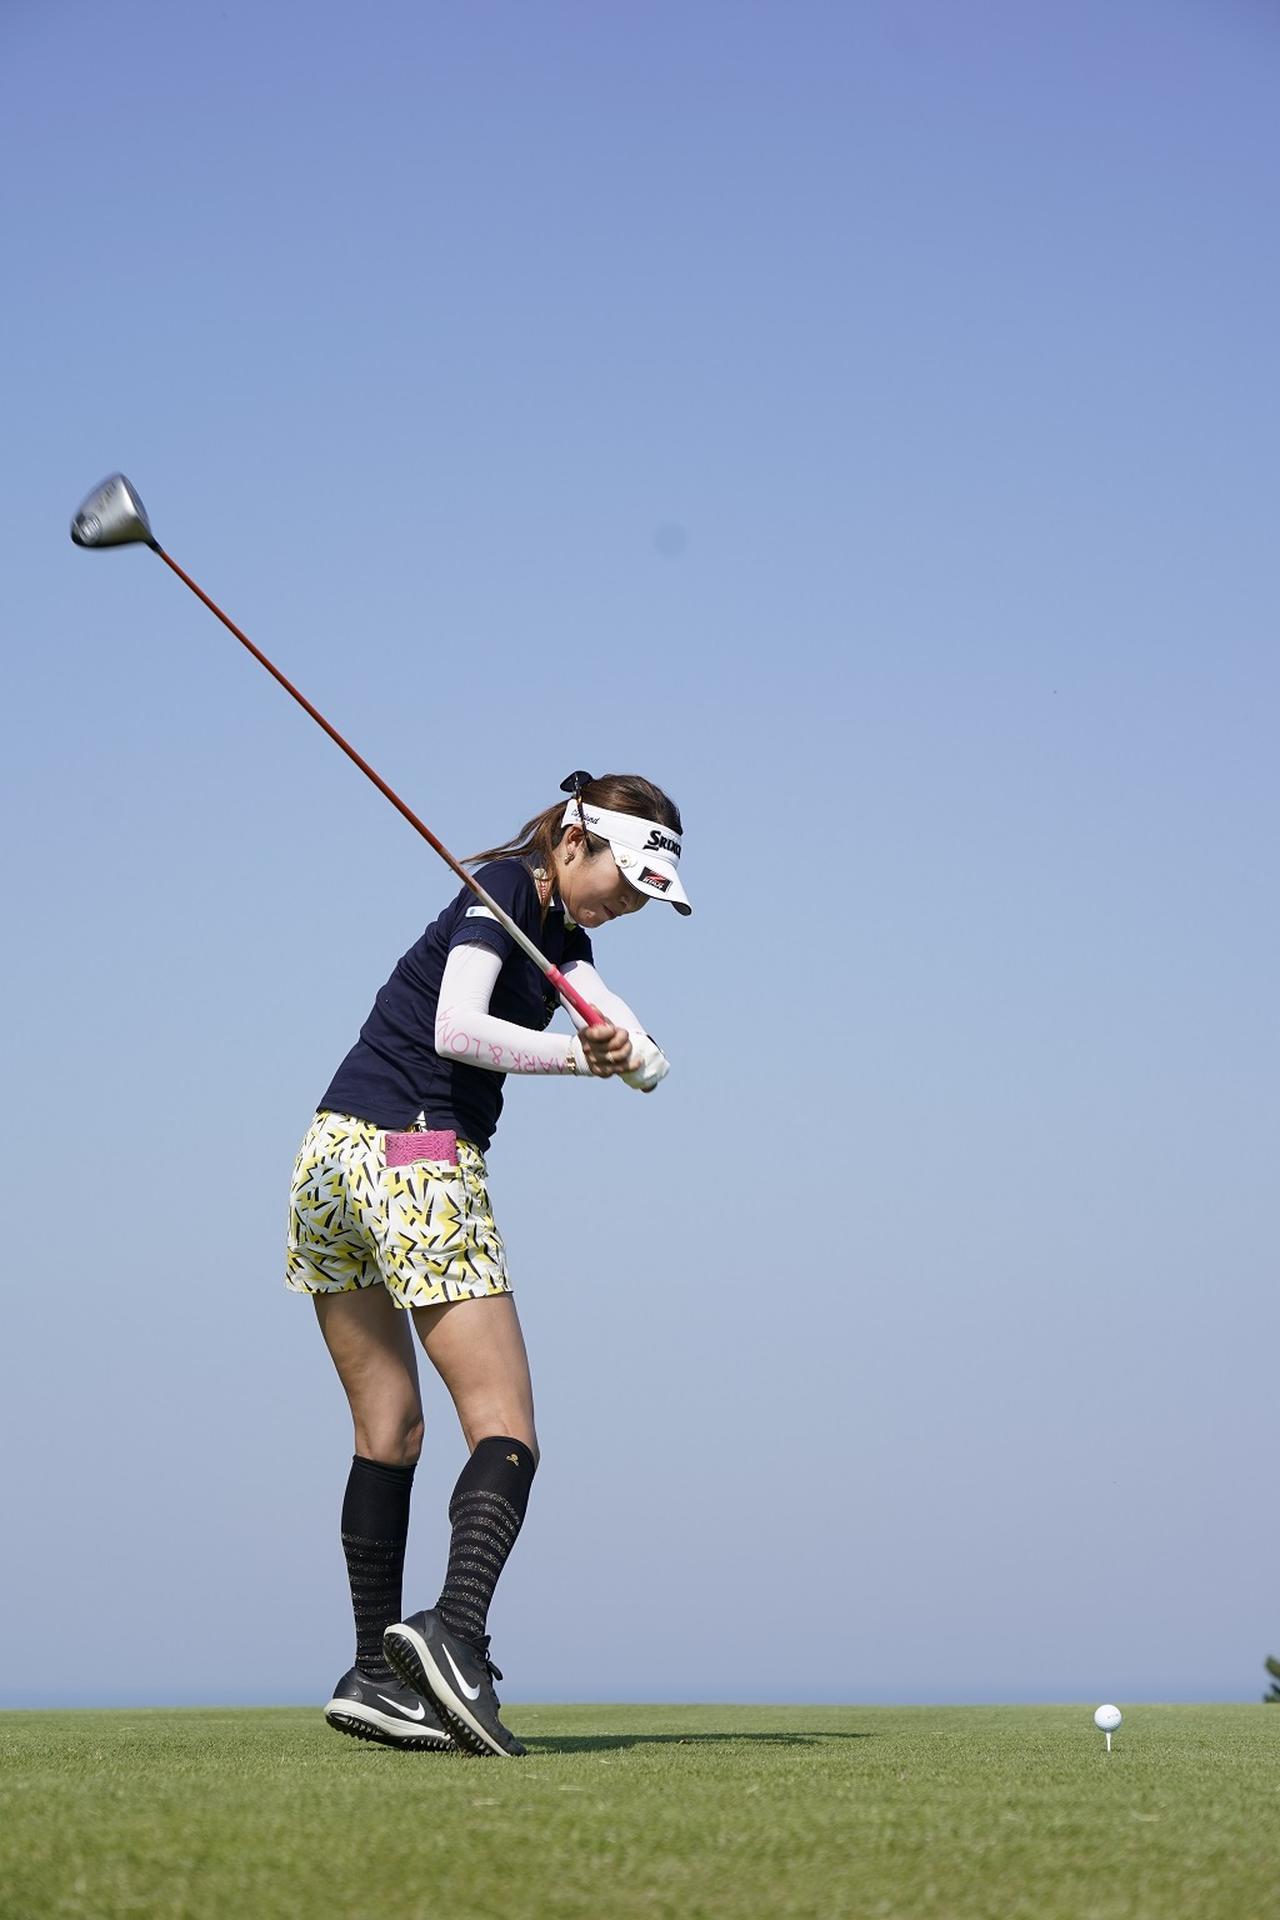 Images : 7番目の画像 - 金田久美子ドライバー後方連続写真 - みんなのゴルフダイジェスト